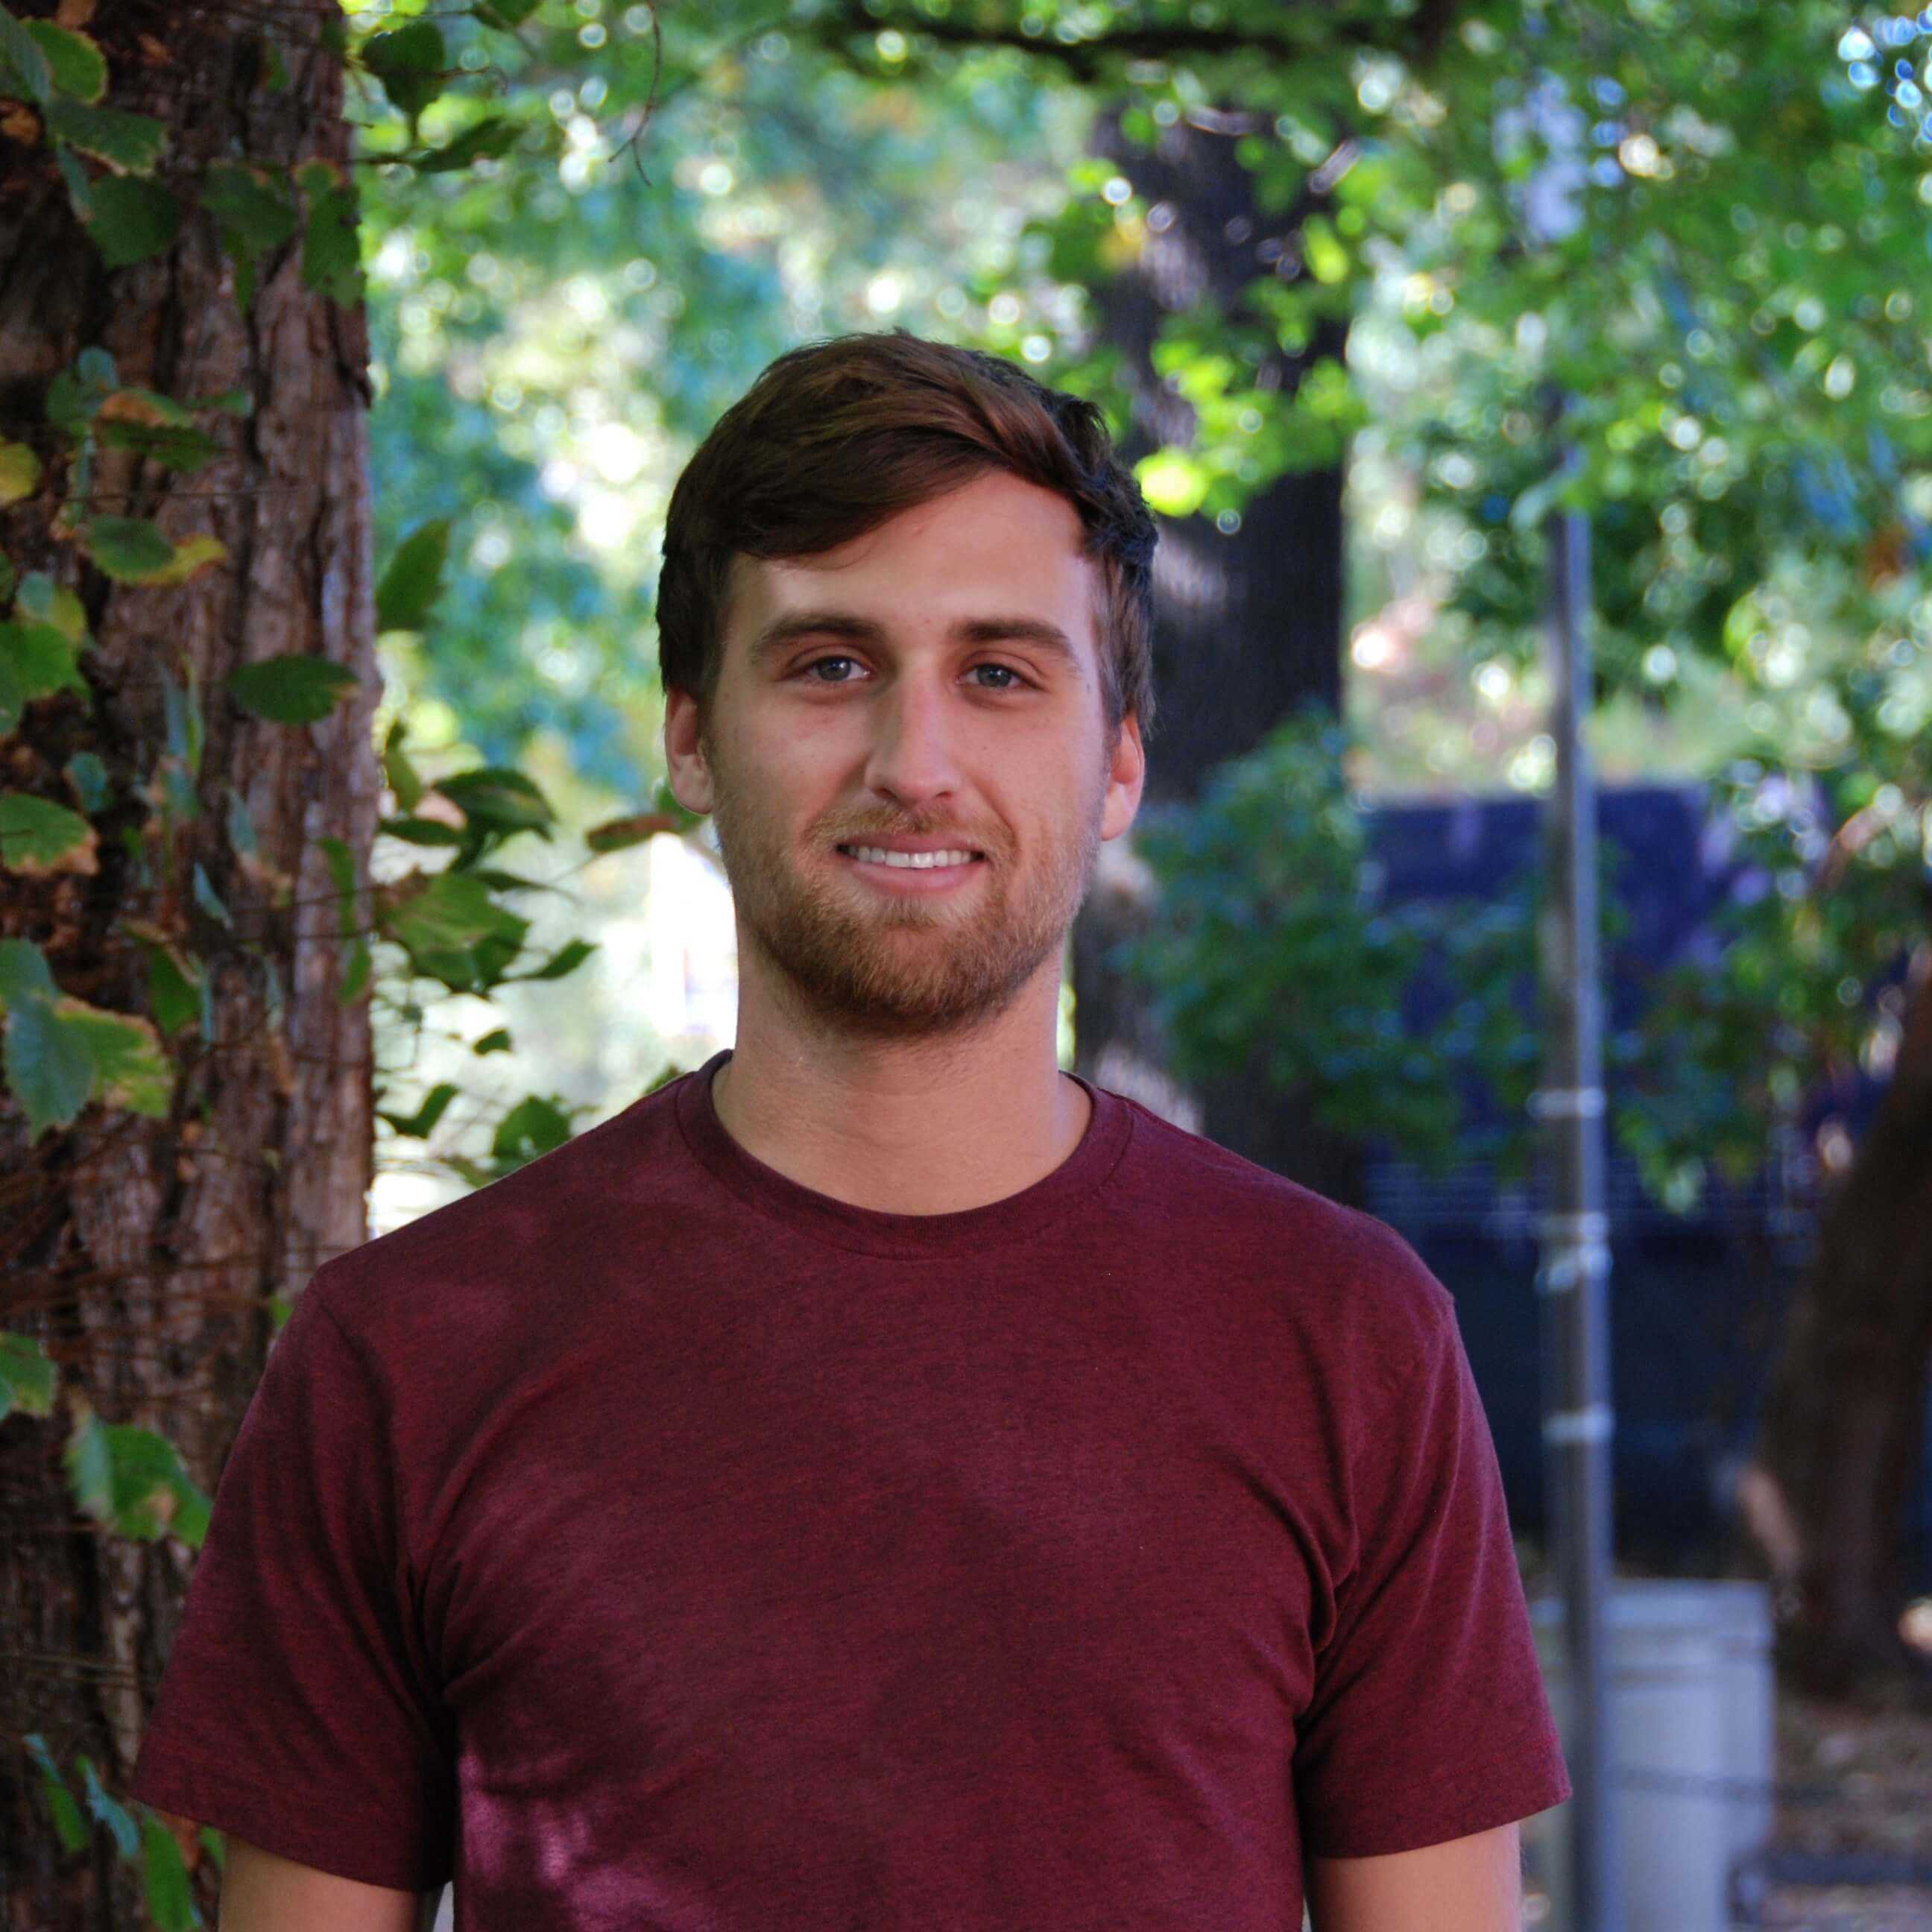 Taylor Cunnington : Graduate Student